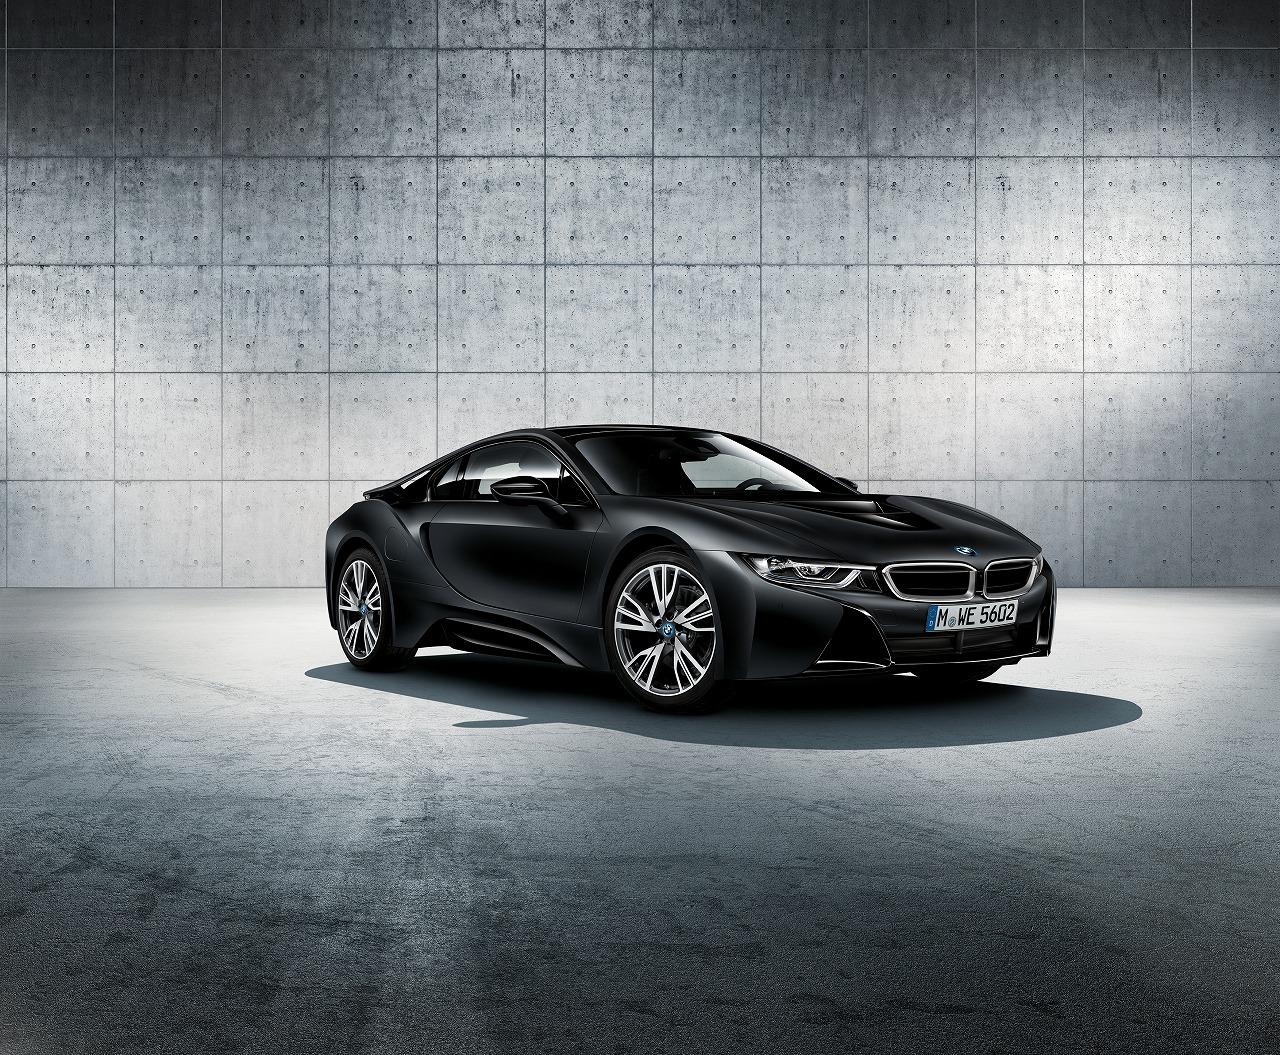 BMW「i8」の限定モデル「Protonic Frozen Black」を限定発売